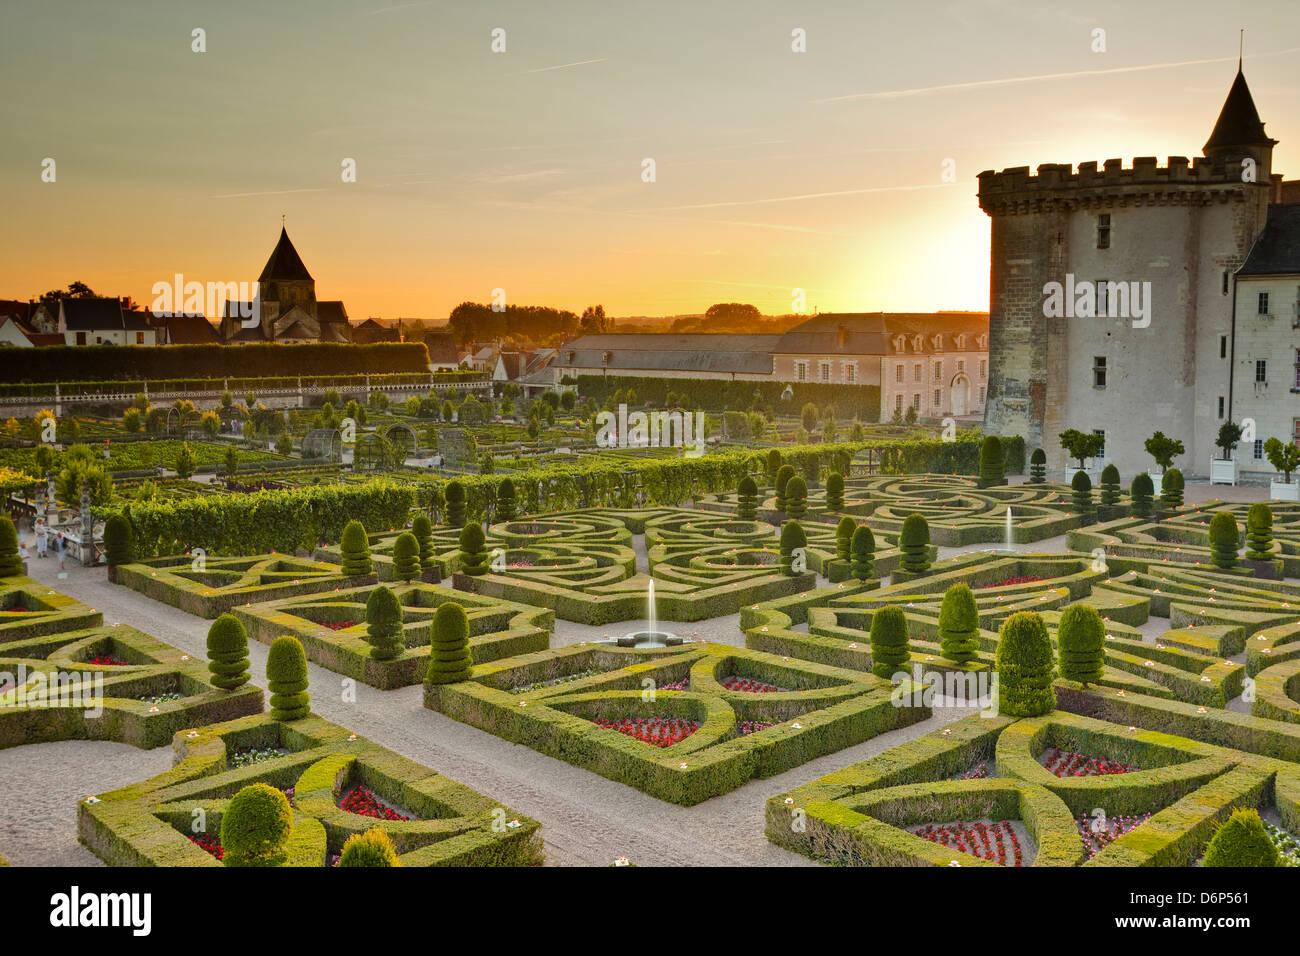 Das Chateau de Villandry mit seinen Gärten bei Sonnenuntergang, UNESCO-Weltkulturerbe, Indre-et-Loire, Loire-Tal, Stockfoto